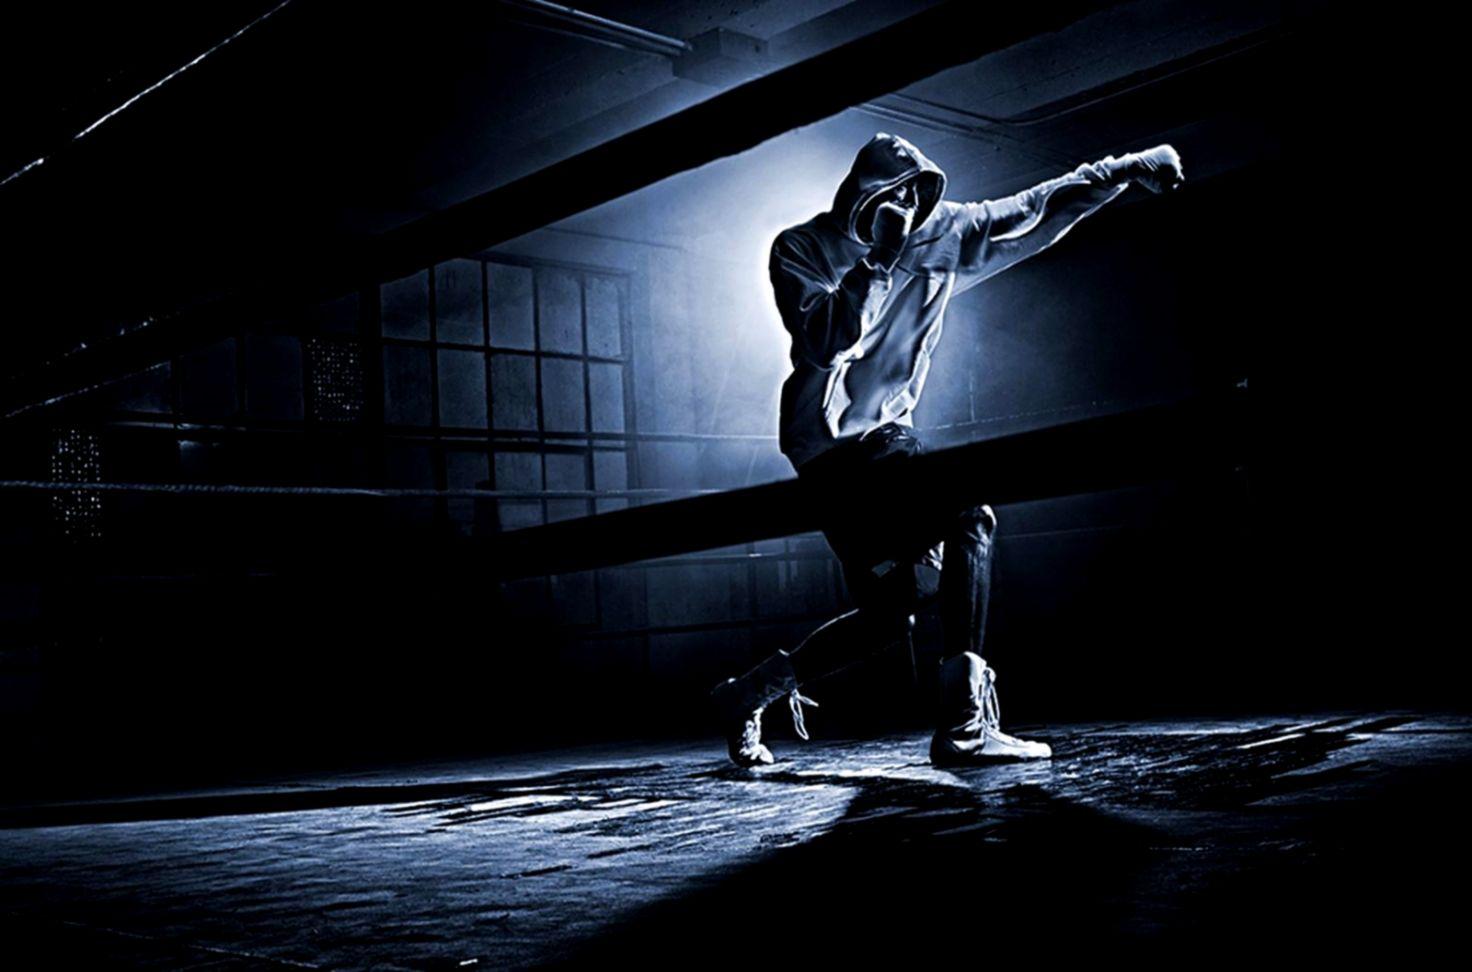 Sport Wallpaper Boxing: Fight Boxing Sport Wallpaper